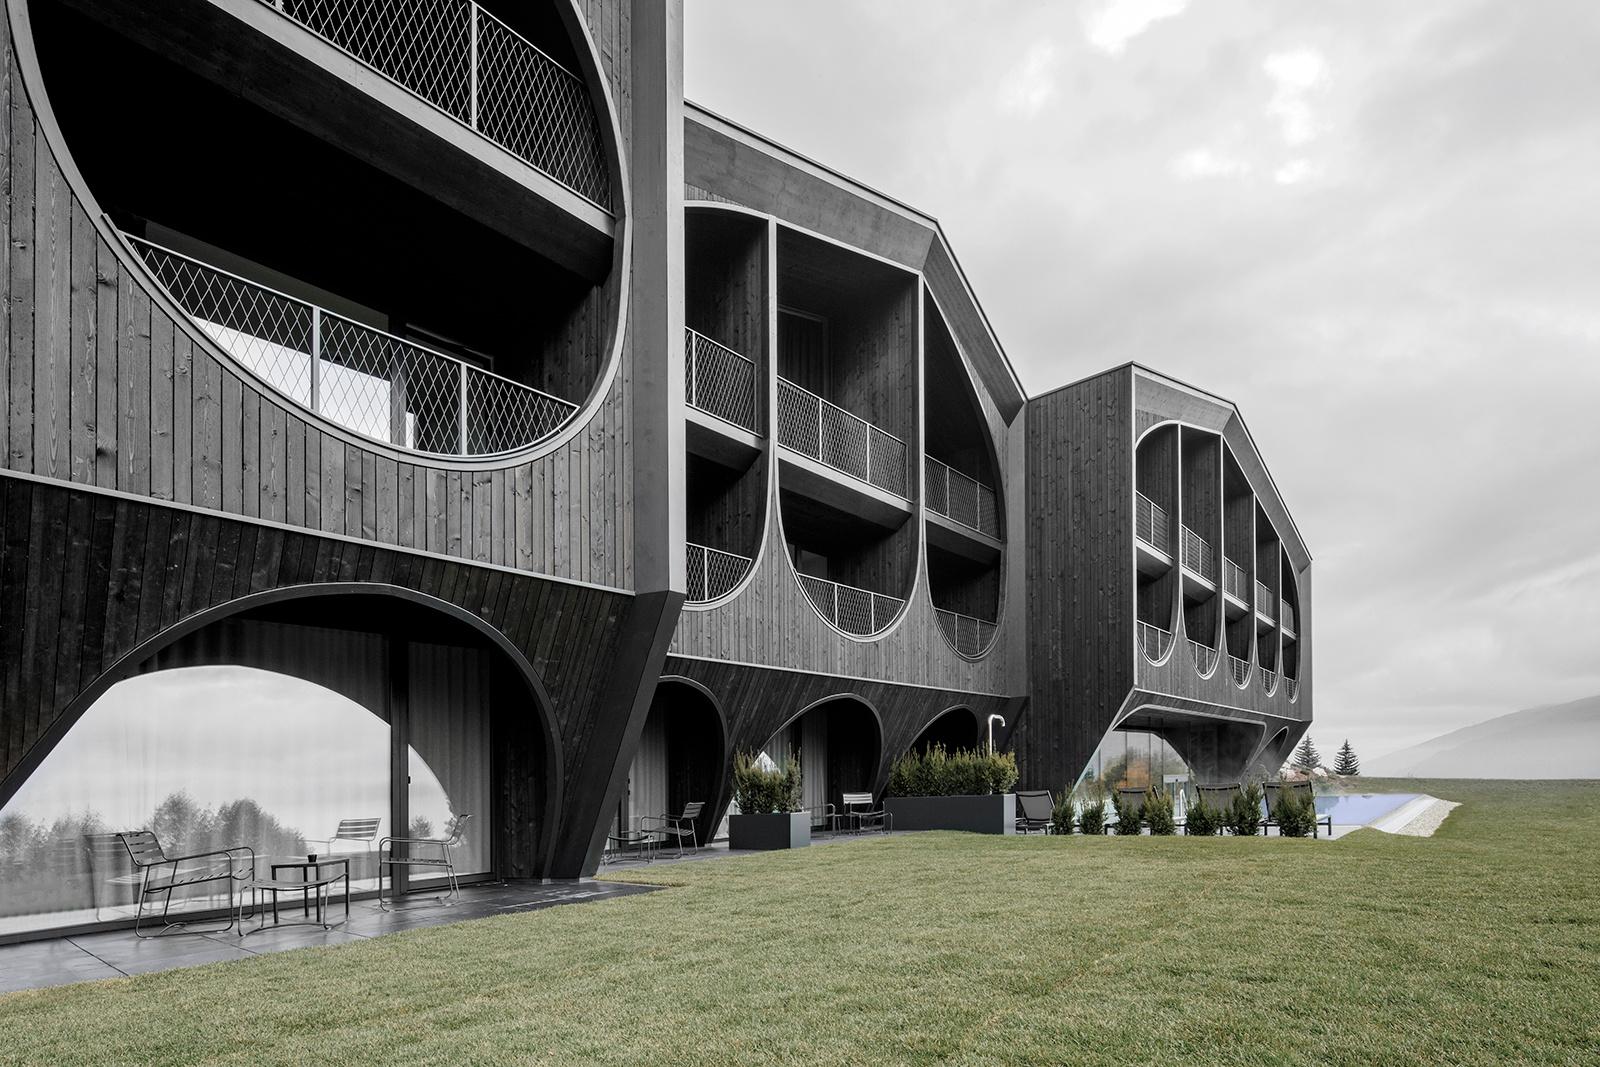 03_Peter_Pichler_Architecture_Hotel_Milla_Montis